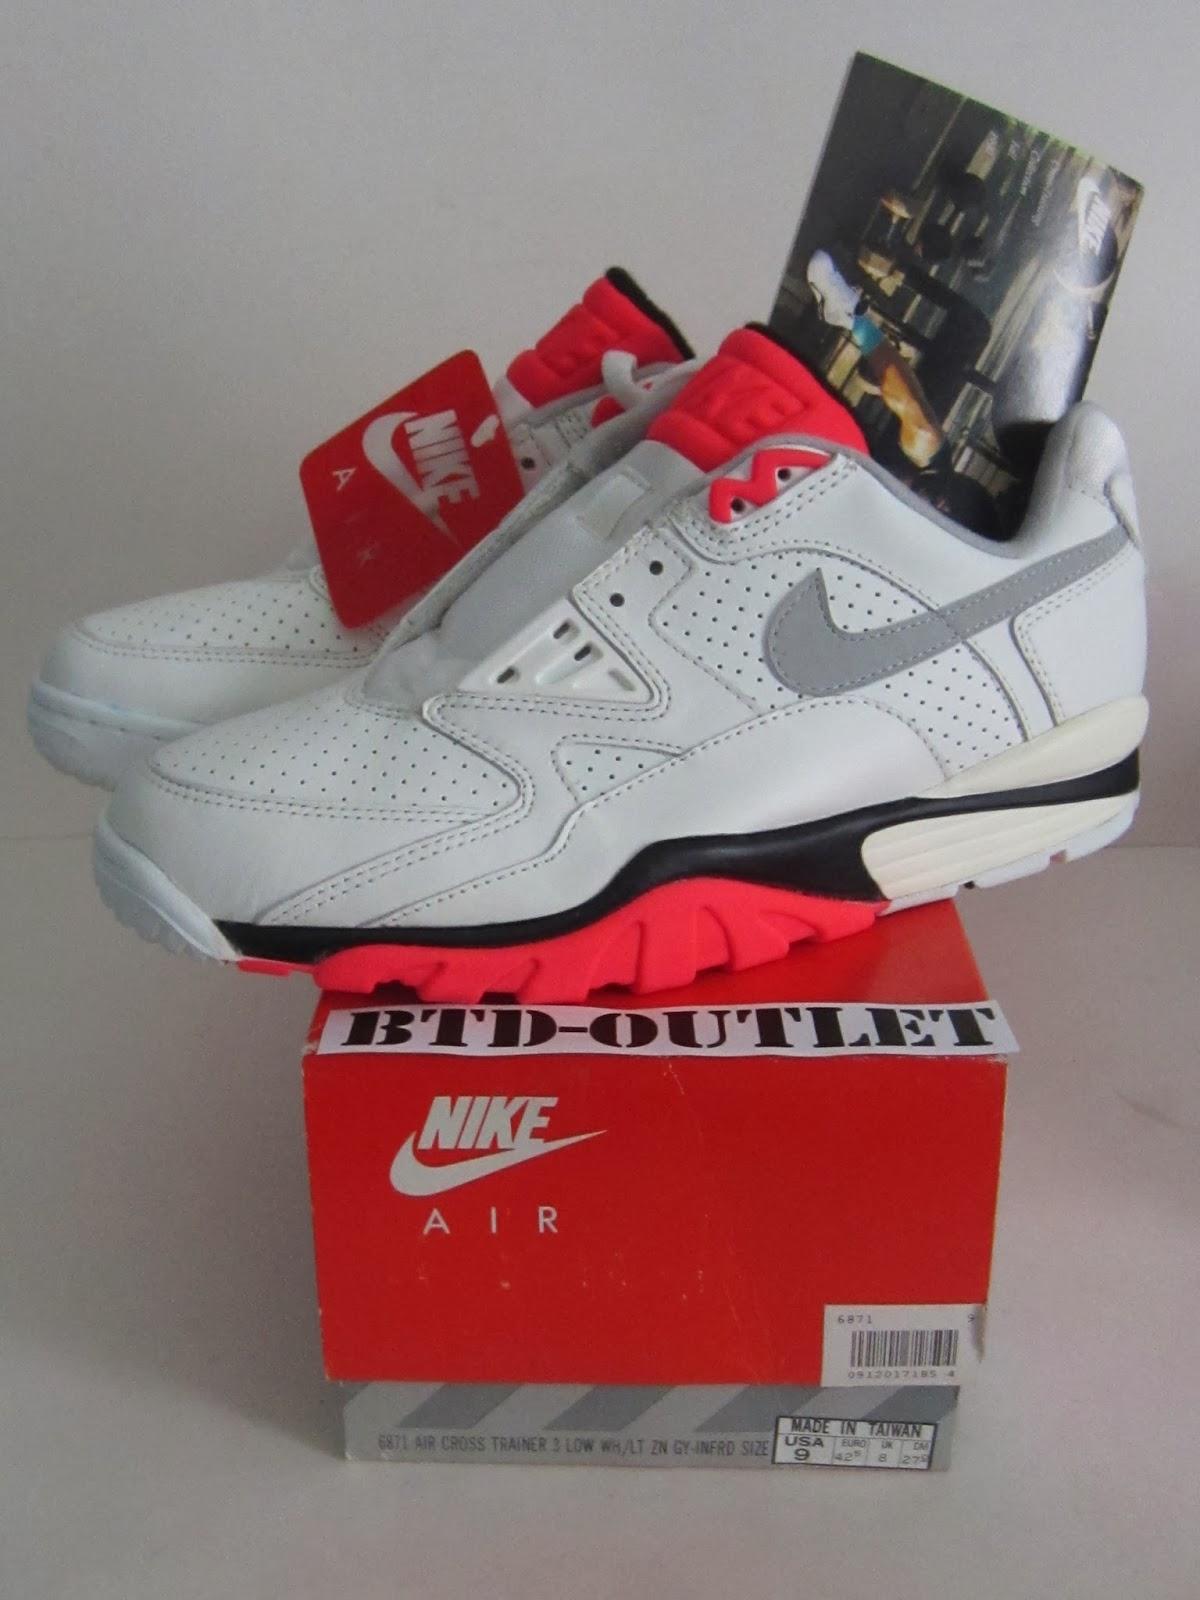 1aa50fbfb Vintage Sports Apparel  Vintage 1990 Nike Air Cross Trainer III low ...